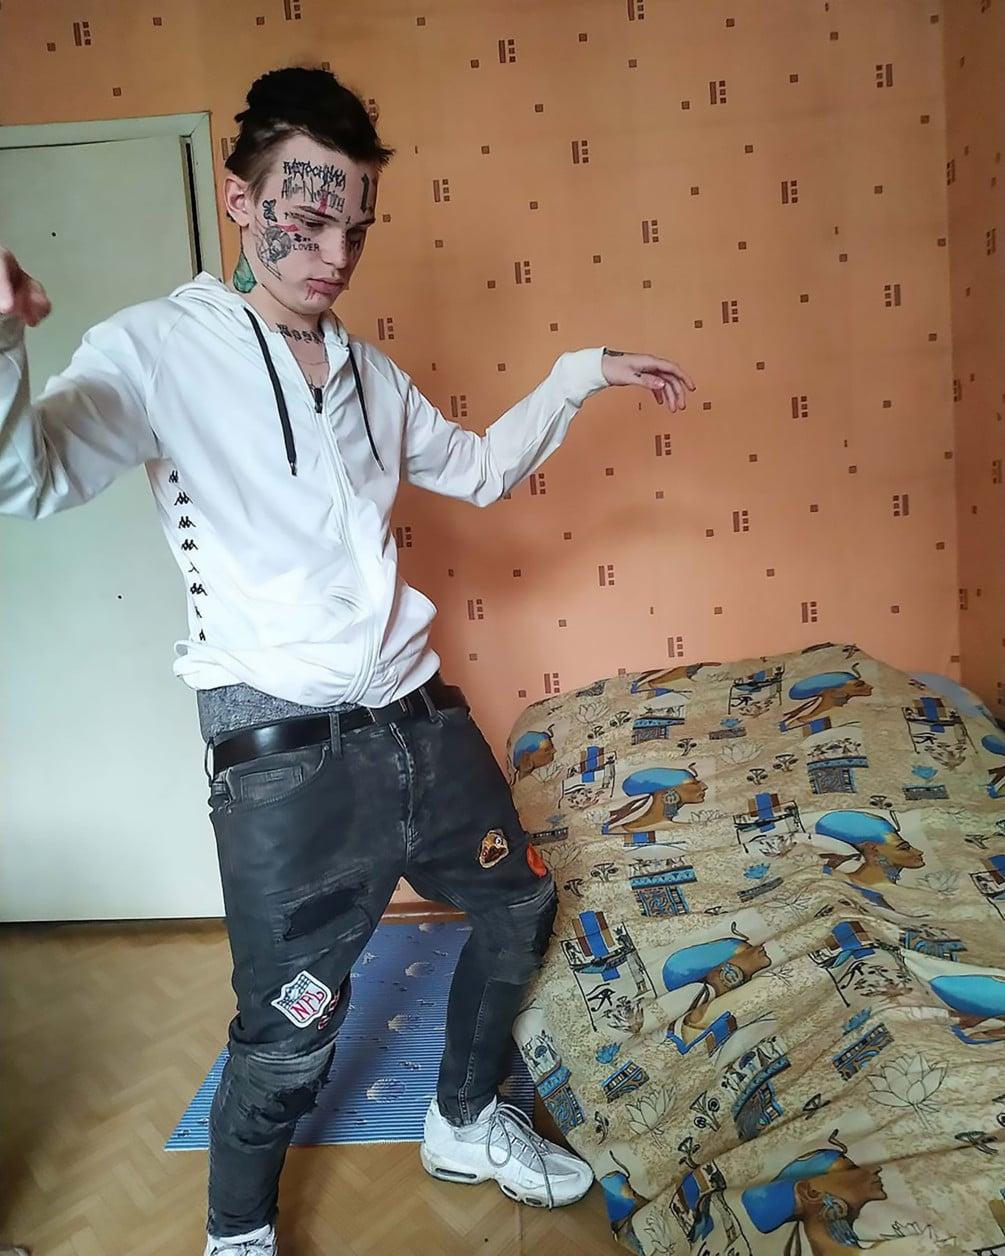 Russian teen tattoos Tekashi 6ix9ine